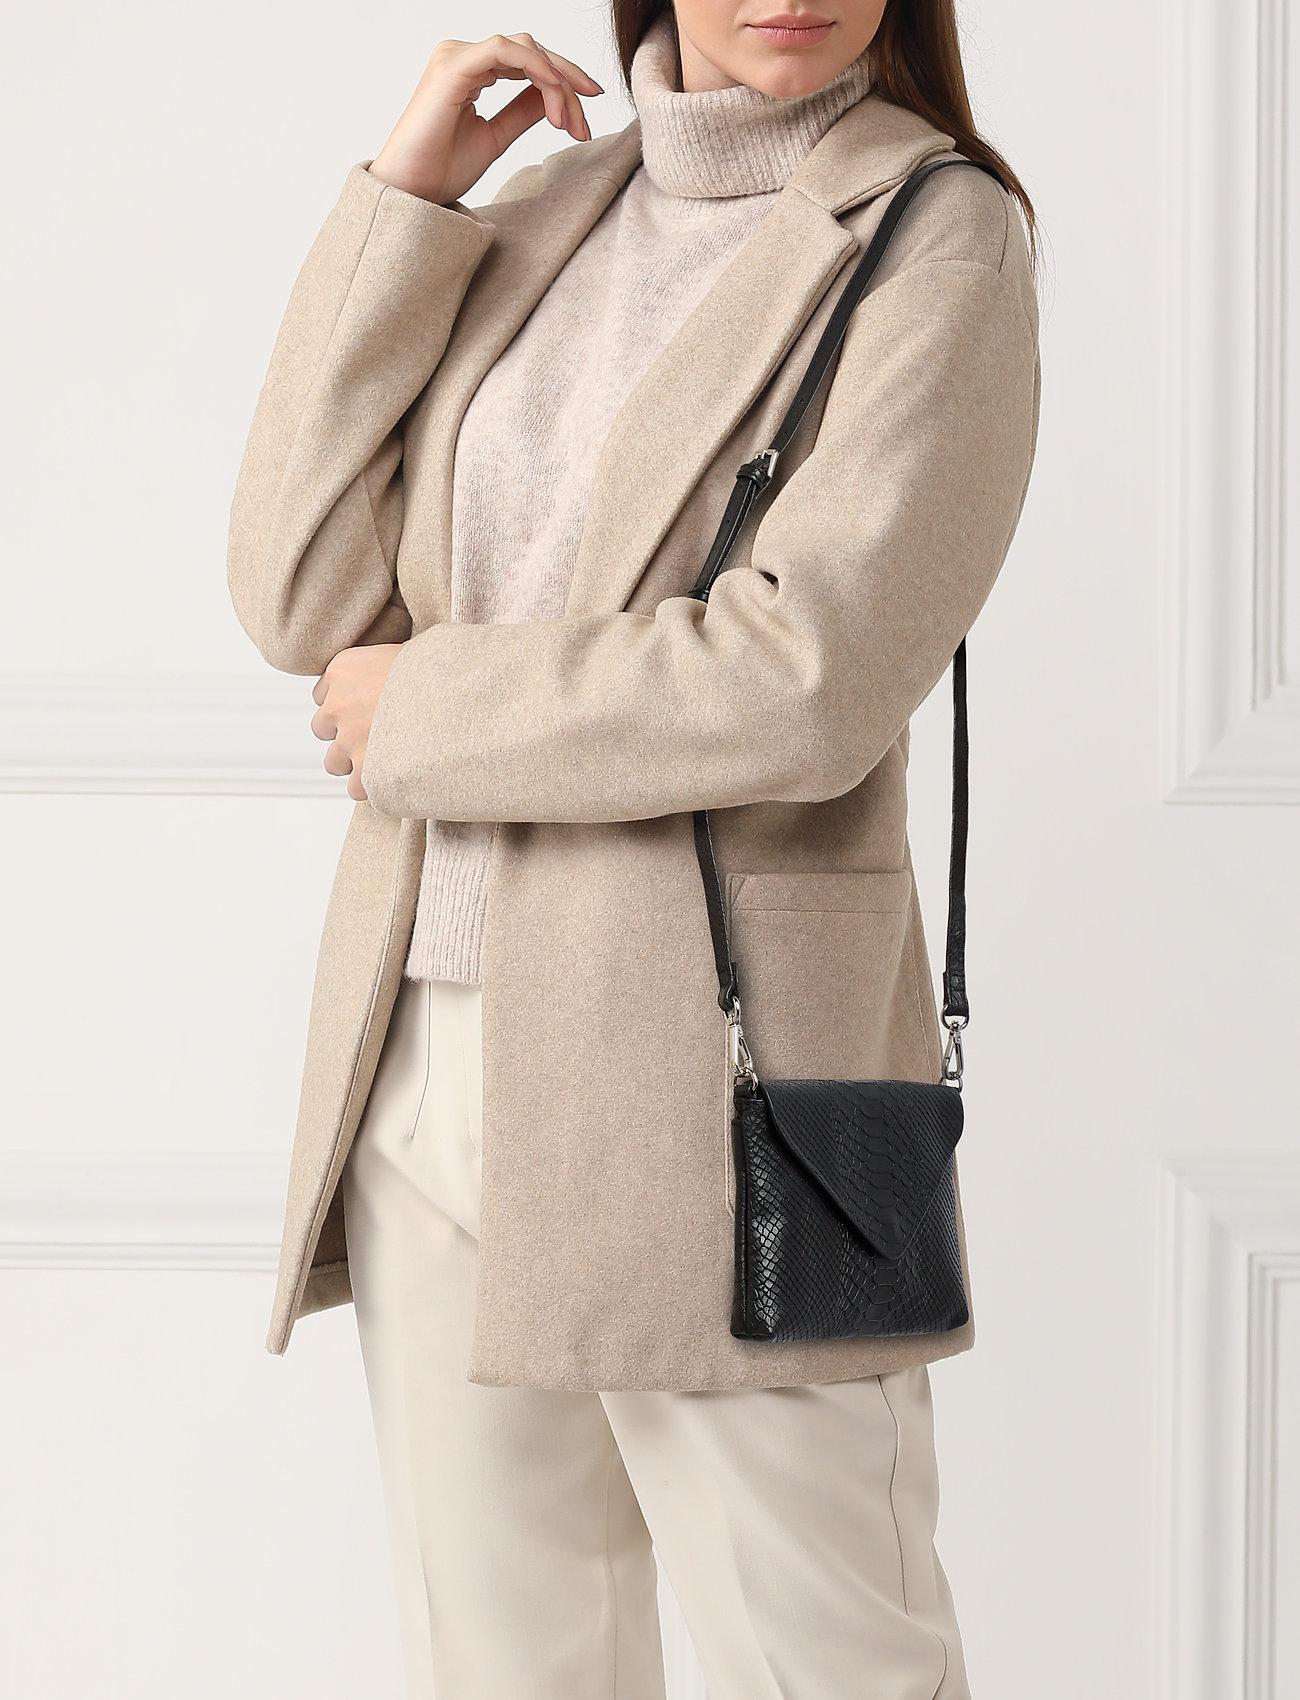 Markberg Jenny Crossbody Bag, Snake - BLACK